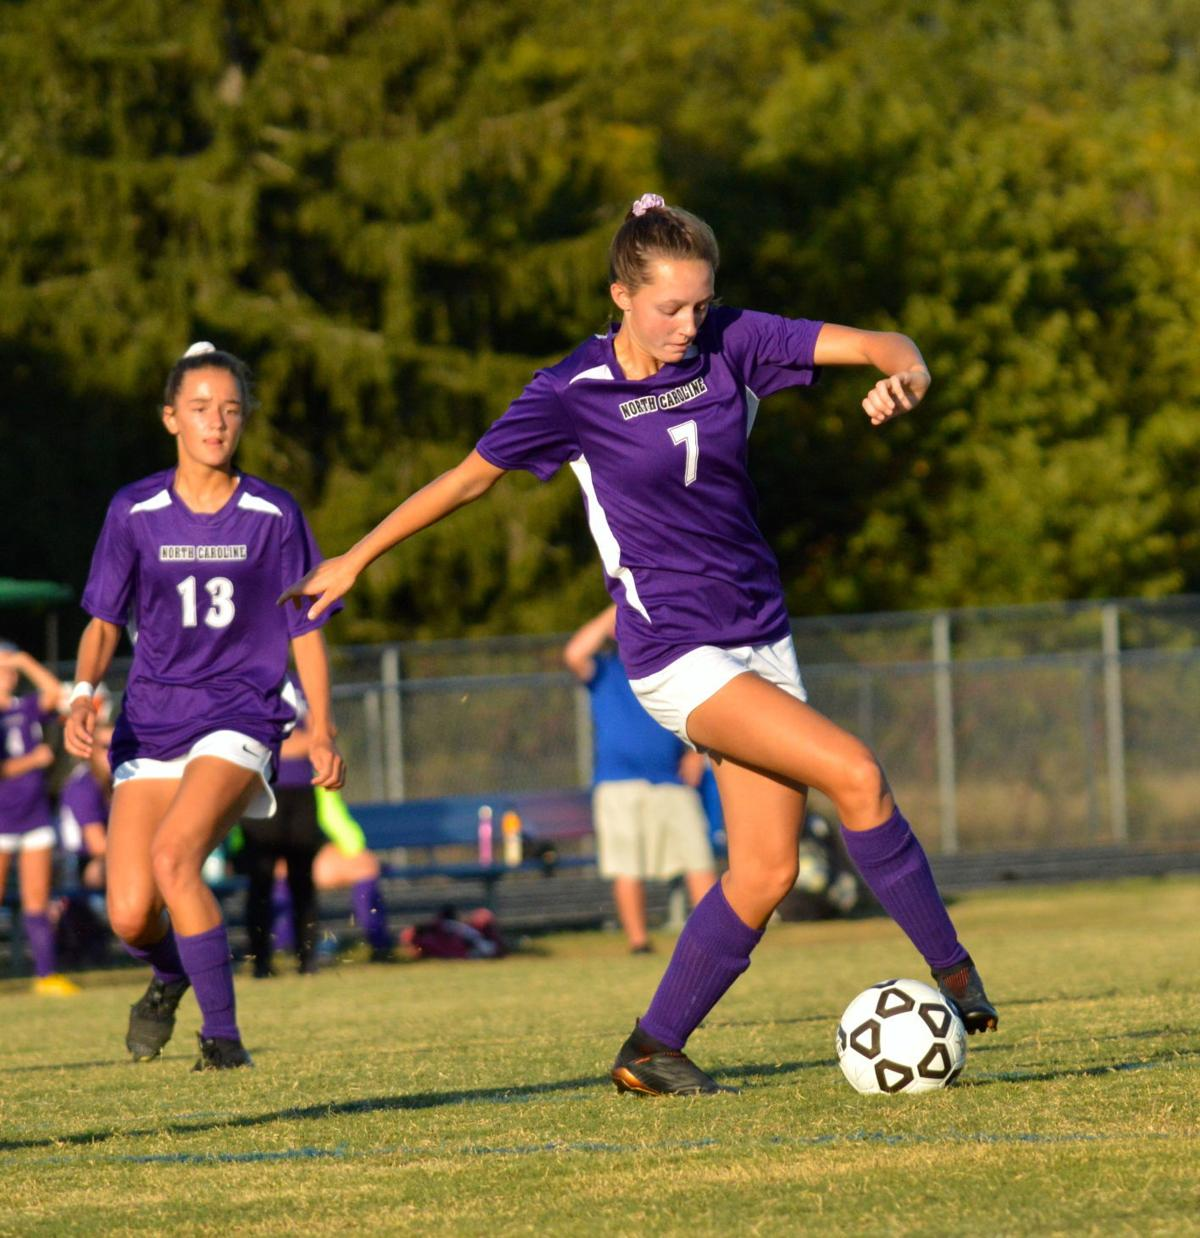 High School Soccer: Kent County at North Caroline